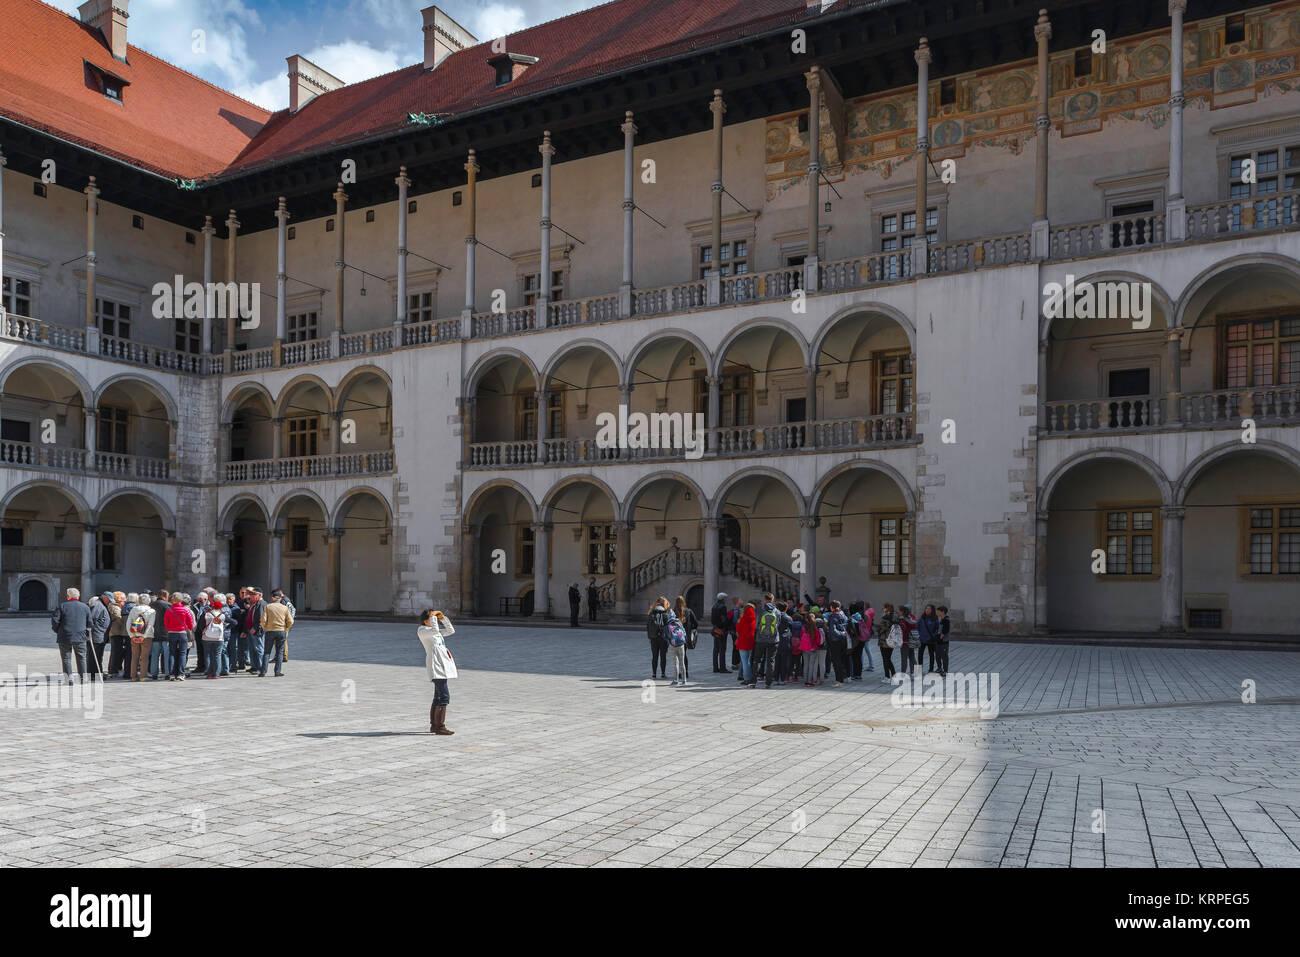 Wawel castle courtyard, the arcaded Renaissance courtyard at the centre of Wawel Royal Castle in Krakow, Poland. - Stock Image